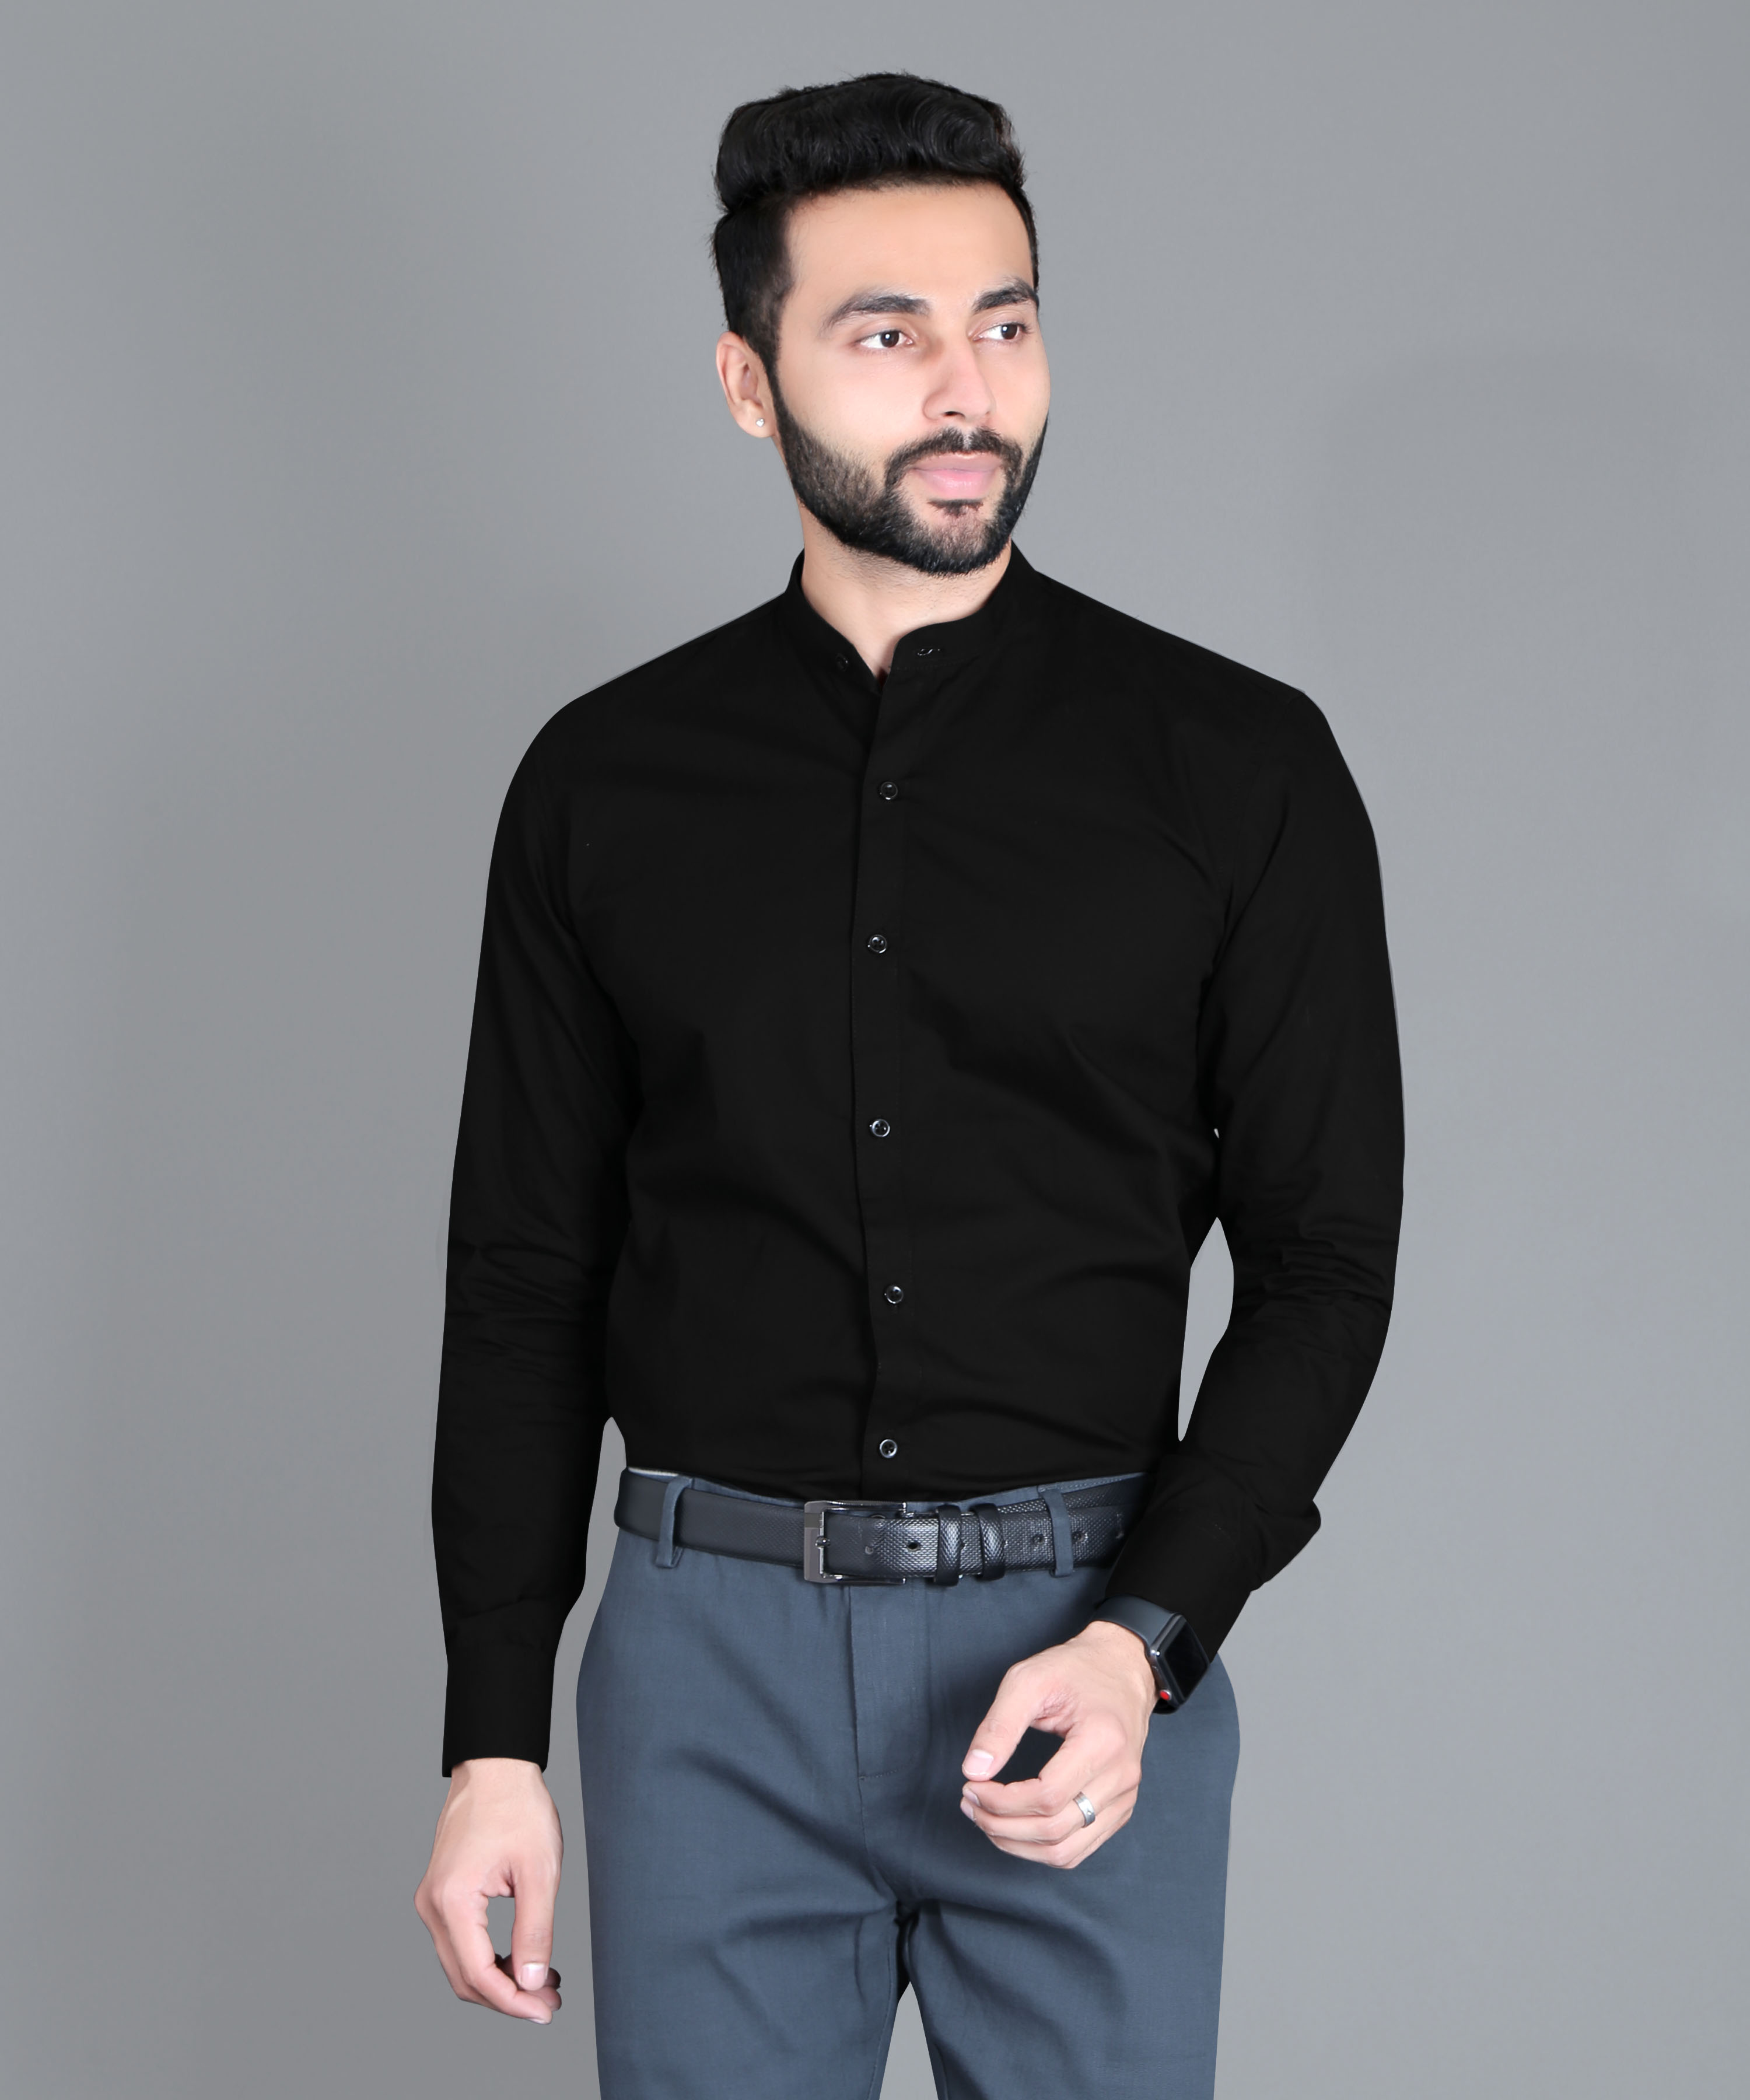 FIFTH ANFOLD Formal Mandrin Collar full Sleev/Long Sleev Black Pure Cotton Plain Solid Men Shirt